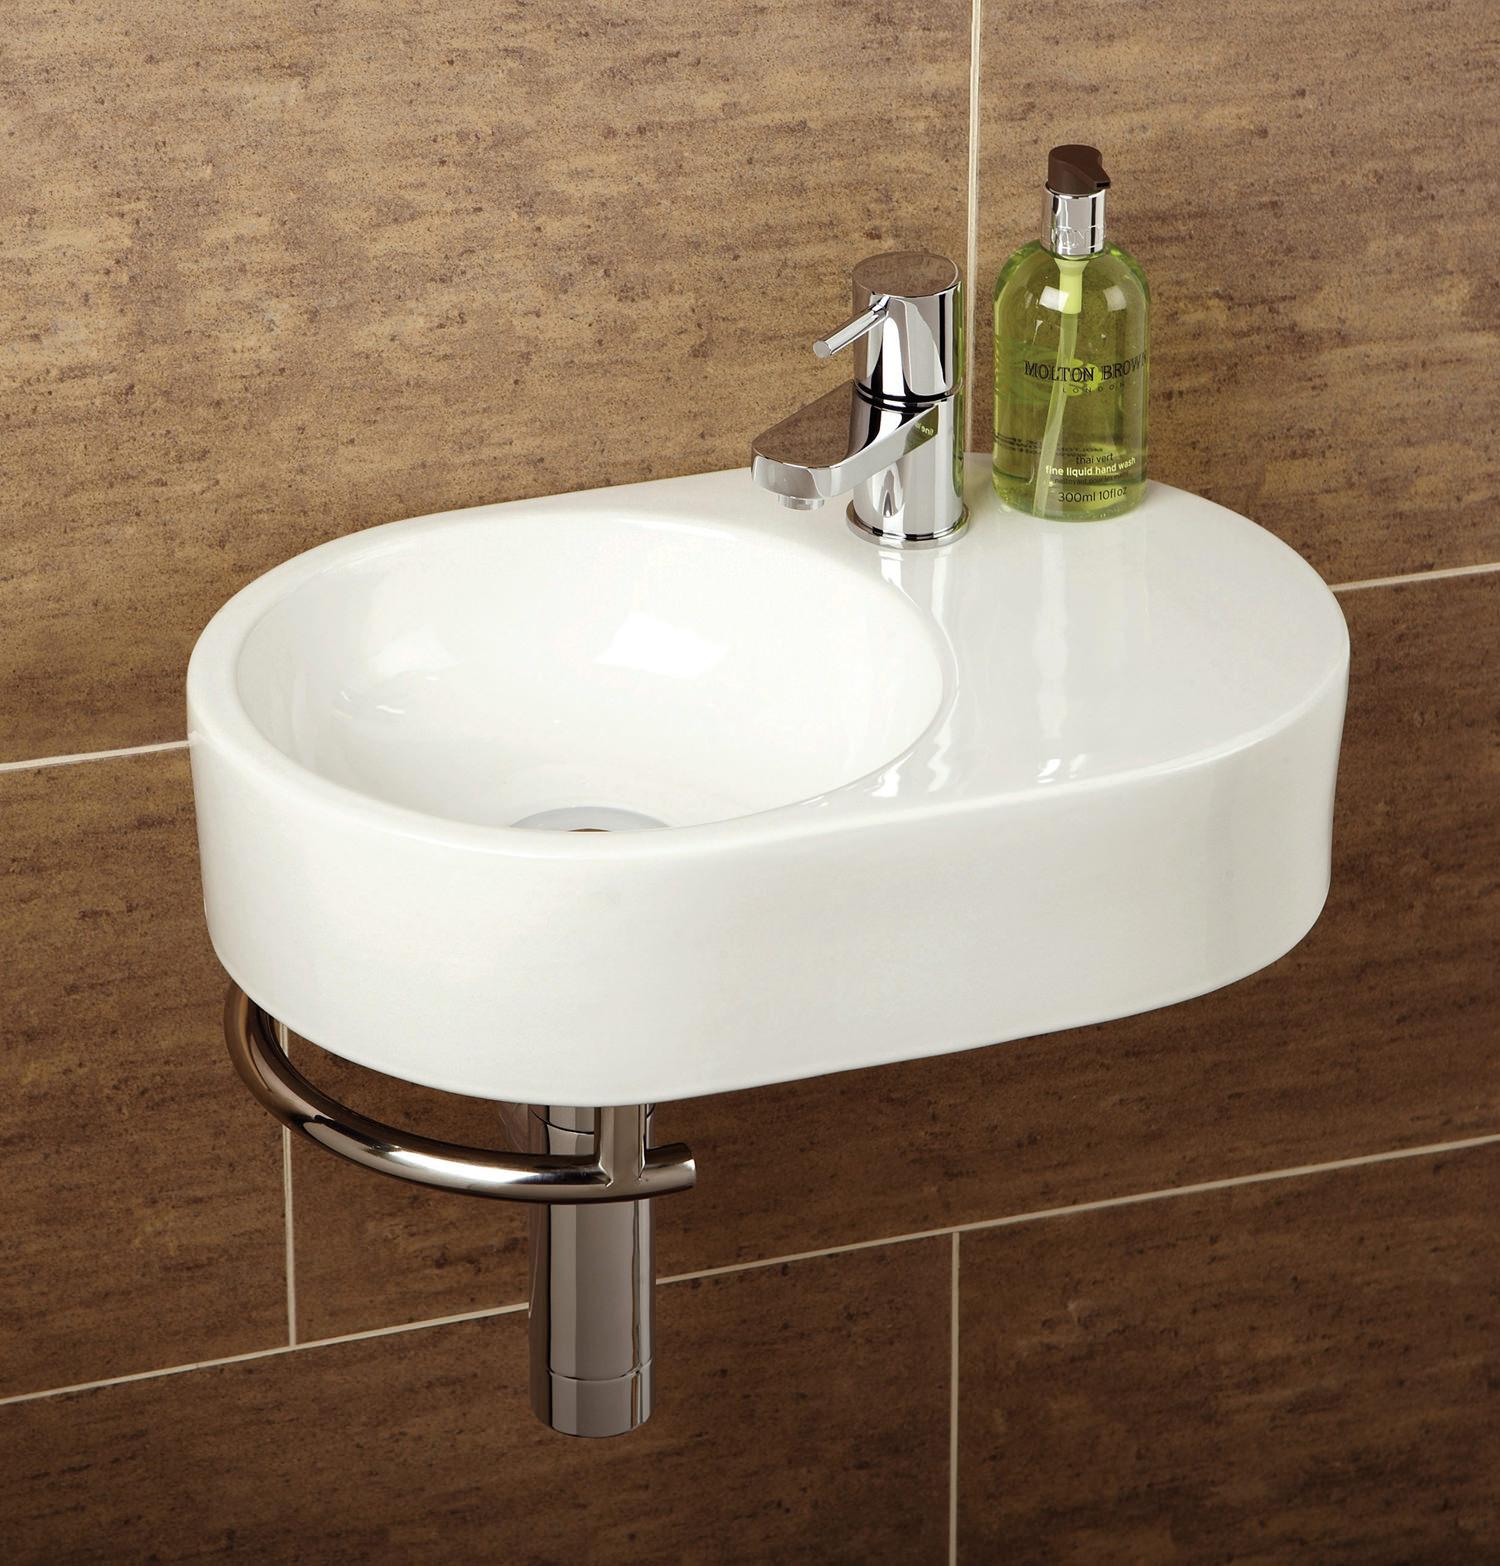 Cloakroom Sink : ... cloakroom basins hib malo saville cloakroom basin with towel rail